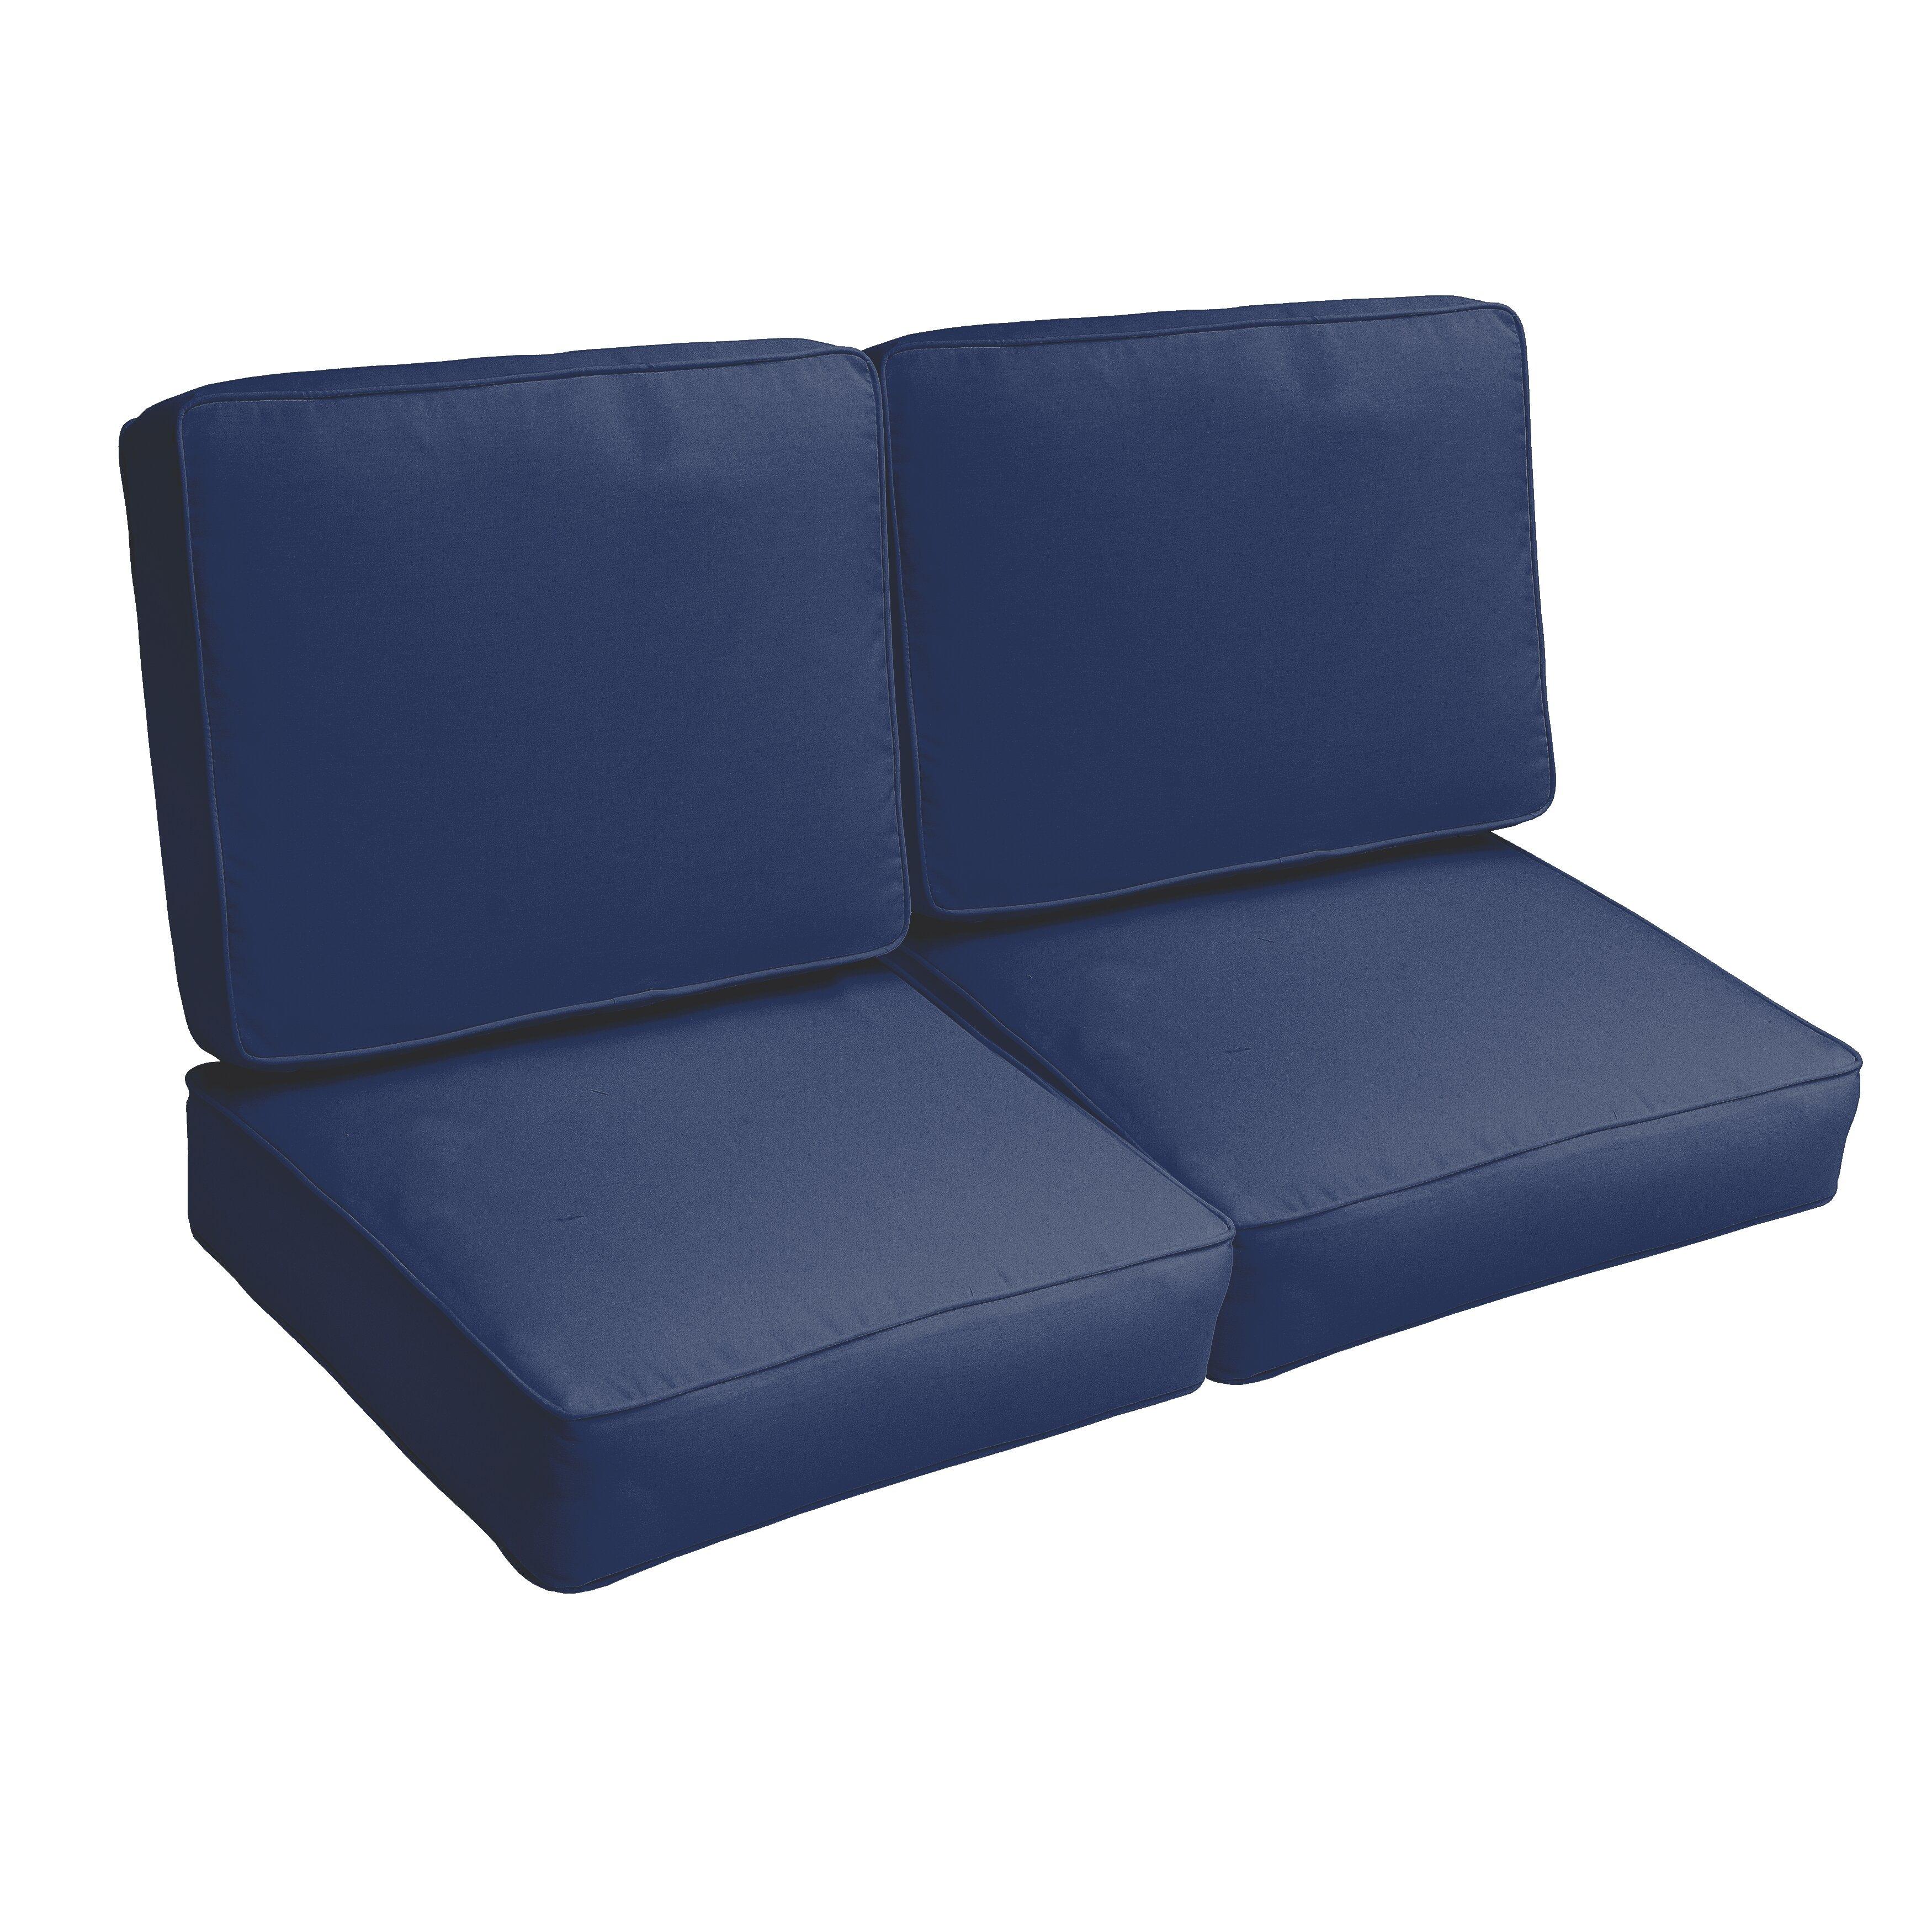 boy sets sawyer cushions pillows shop patio black furniture set z at pc cushion loveseat martha seating lake charlotte outdoor como piece stewart la covers replacement